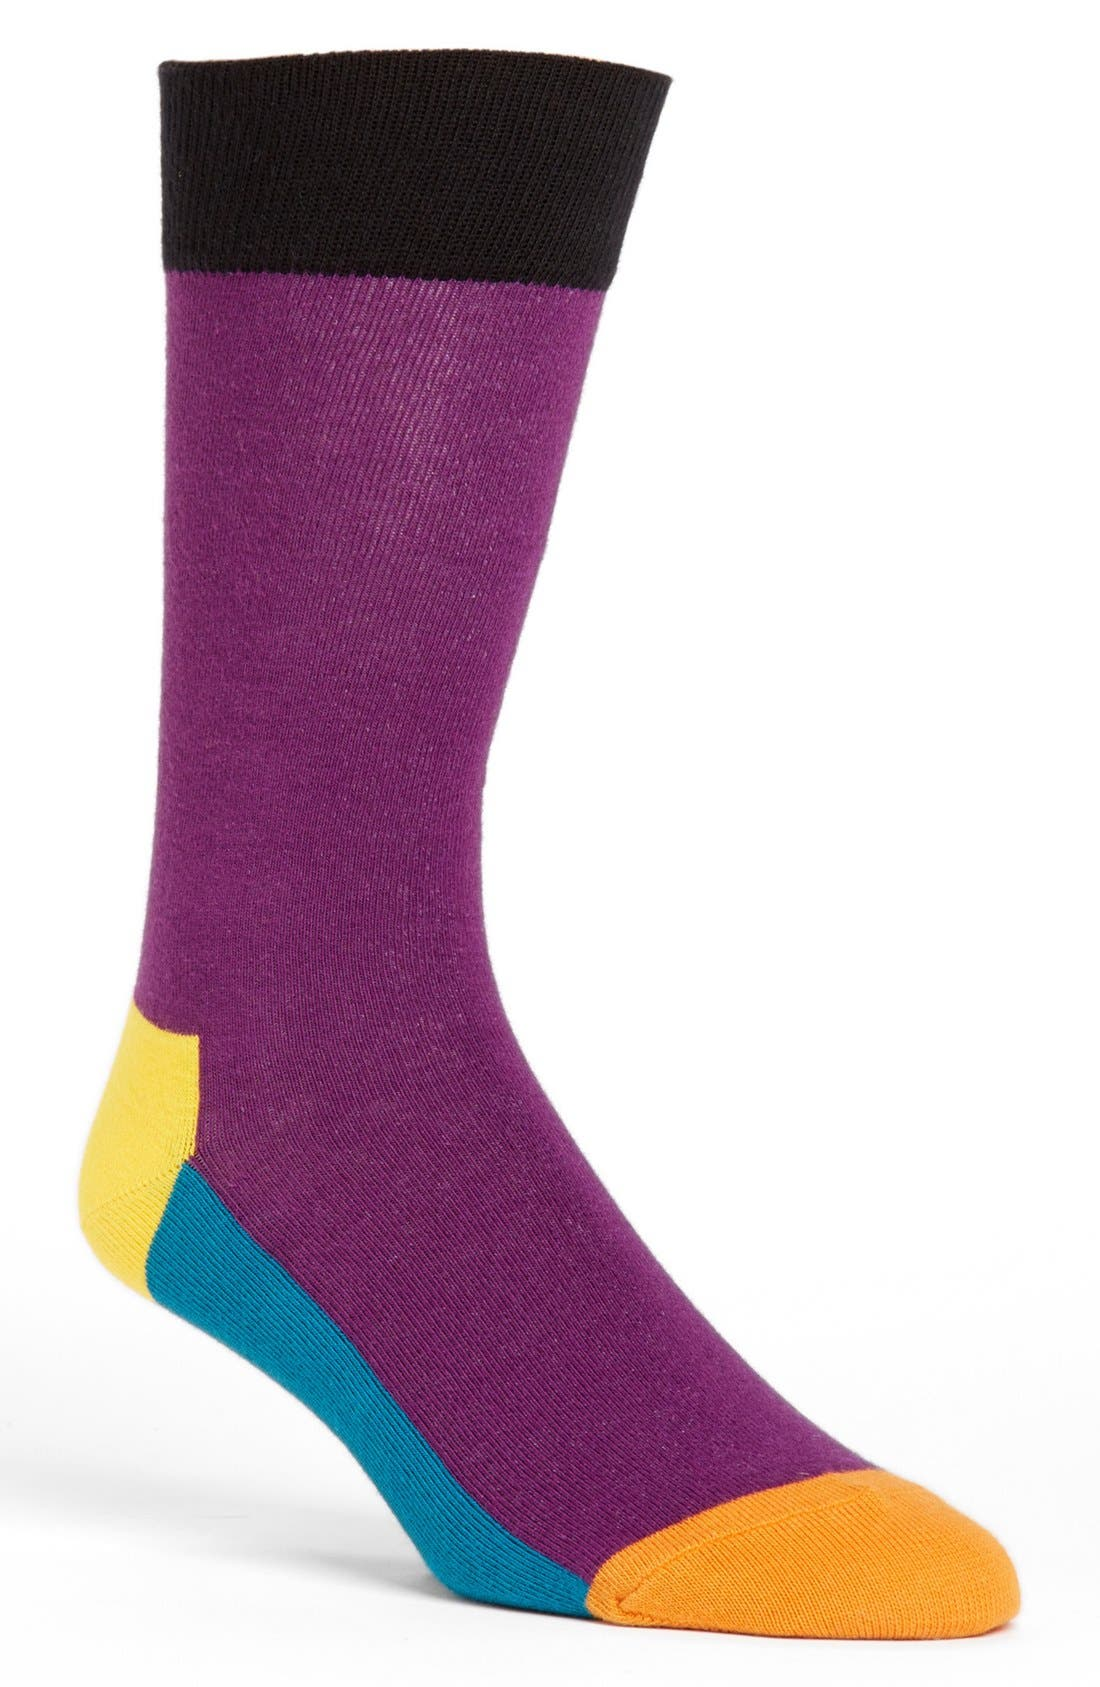 Alternate Image 1 Selected - Happy Socks 'Five Color' Socks